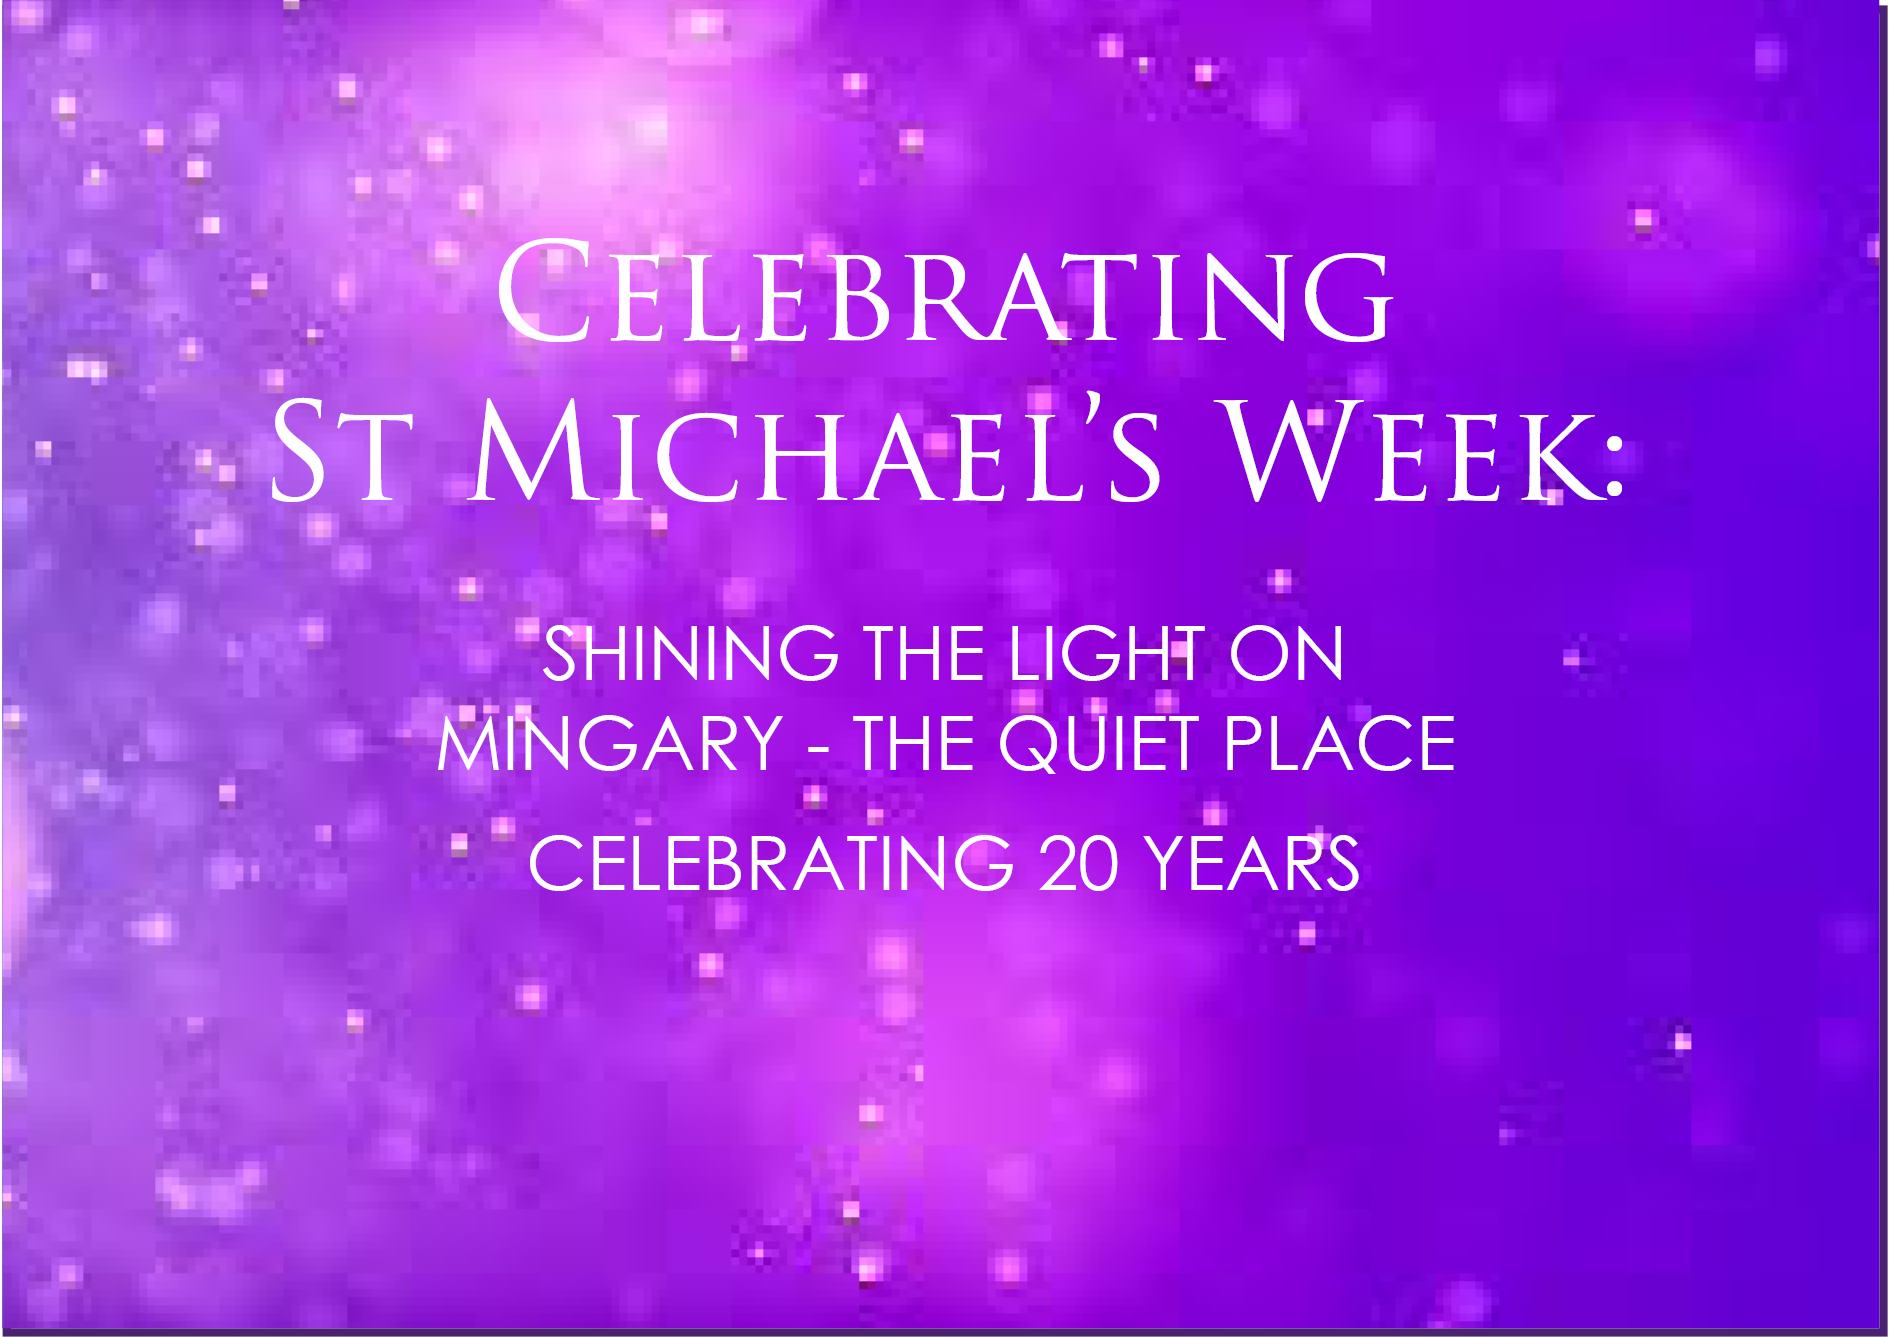 St Michael's Week 2019 Banner